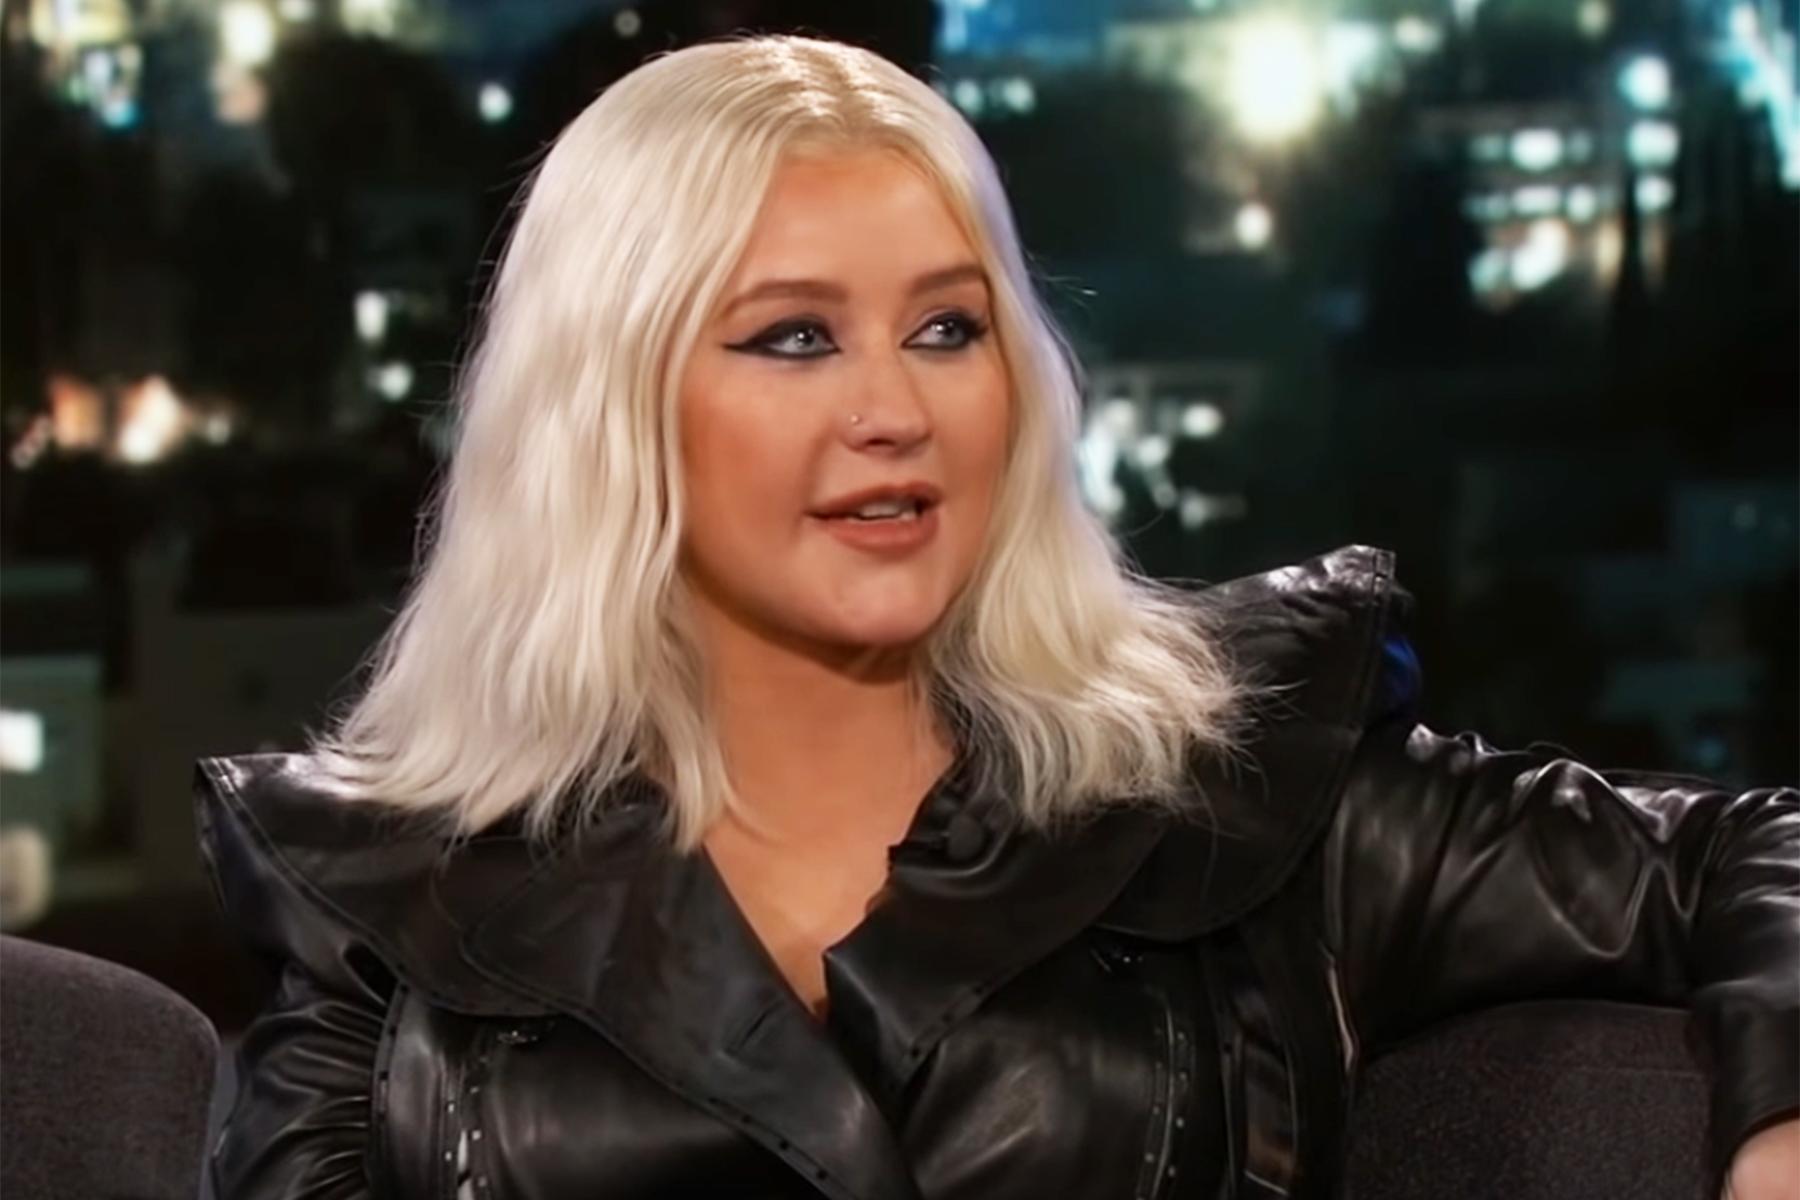 Christina Aguilera Talks Britney Spears Rivalry On Kimmel